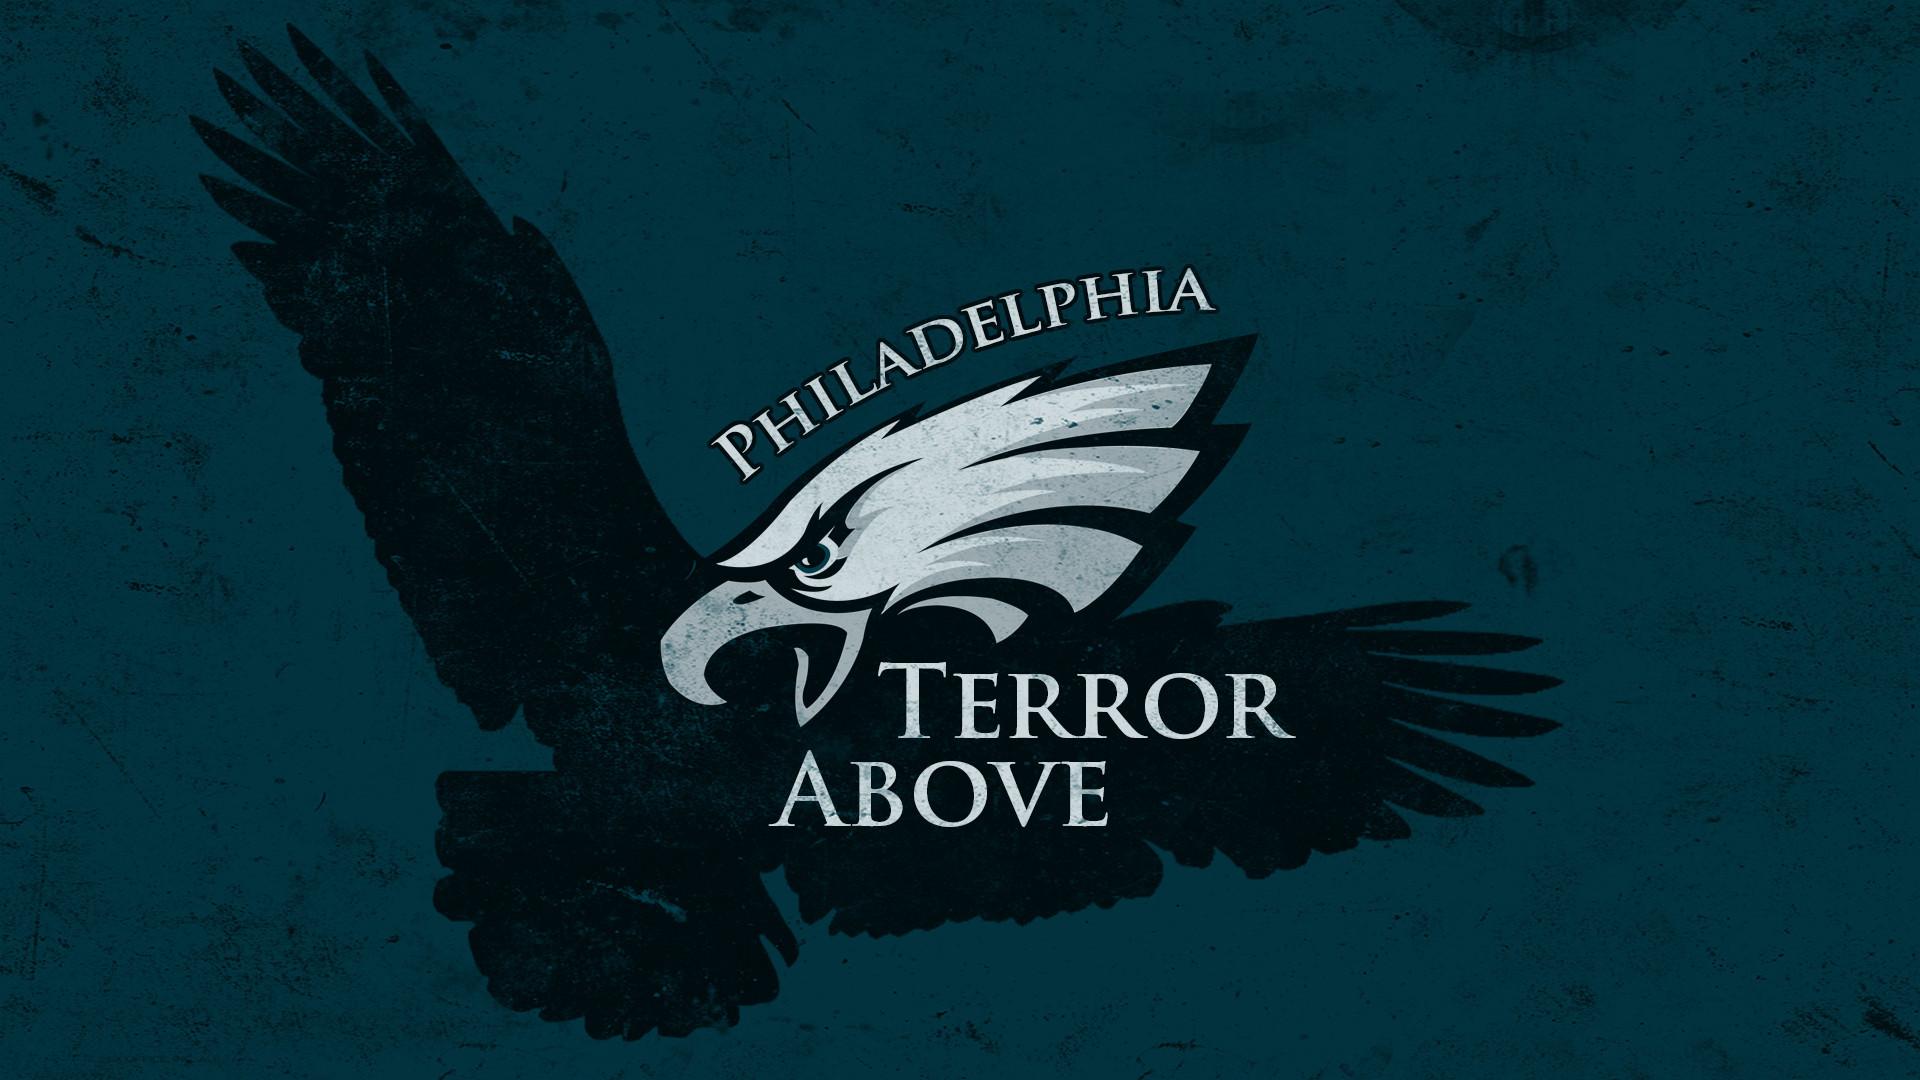 Res: 1920x1080, Philidelphia Eagles logo wallpapers HD download.